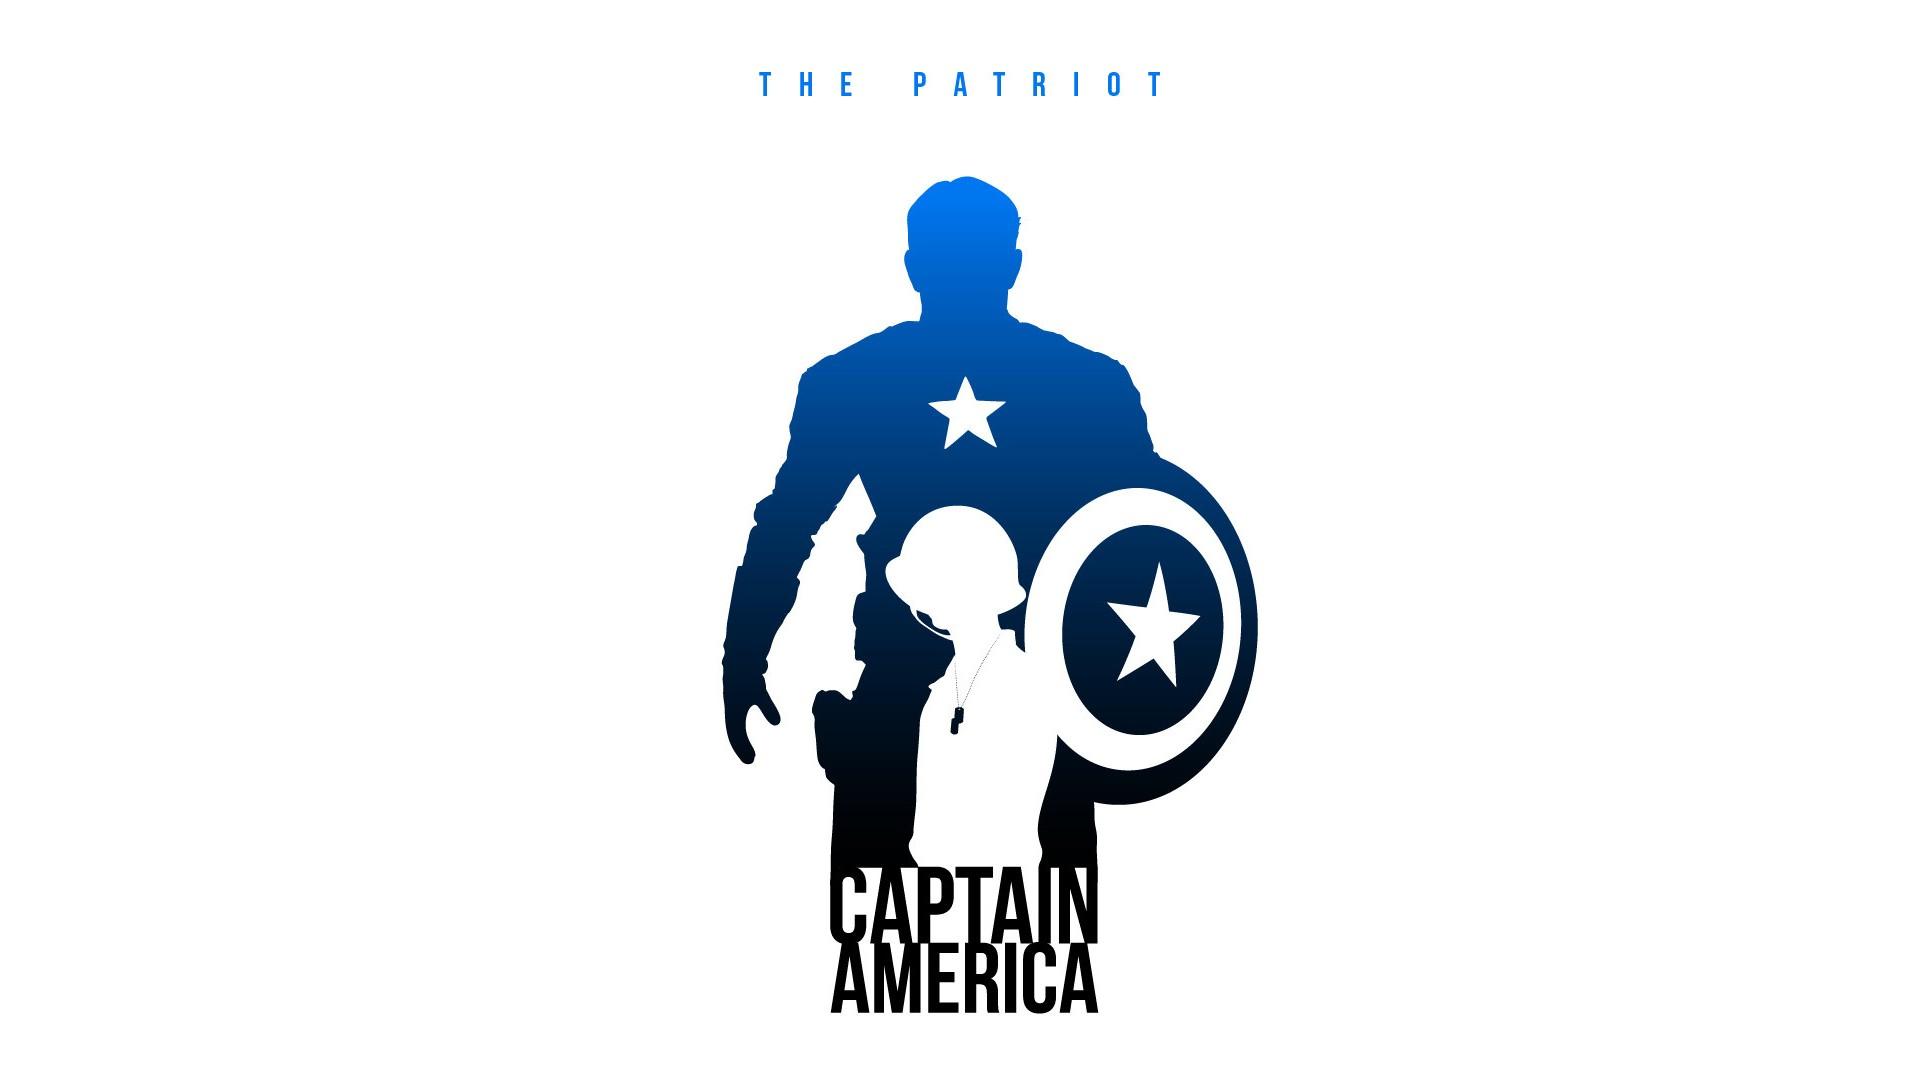 Captain-America-HD-wallpaper-wp3603911